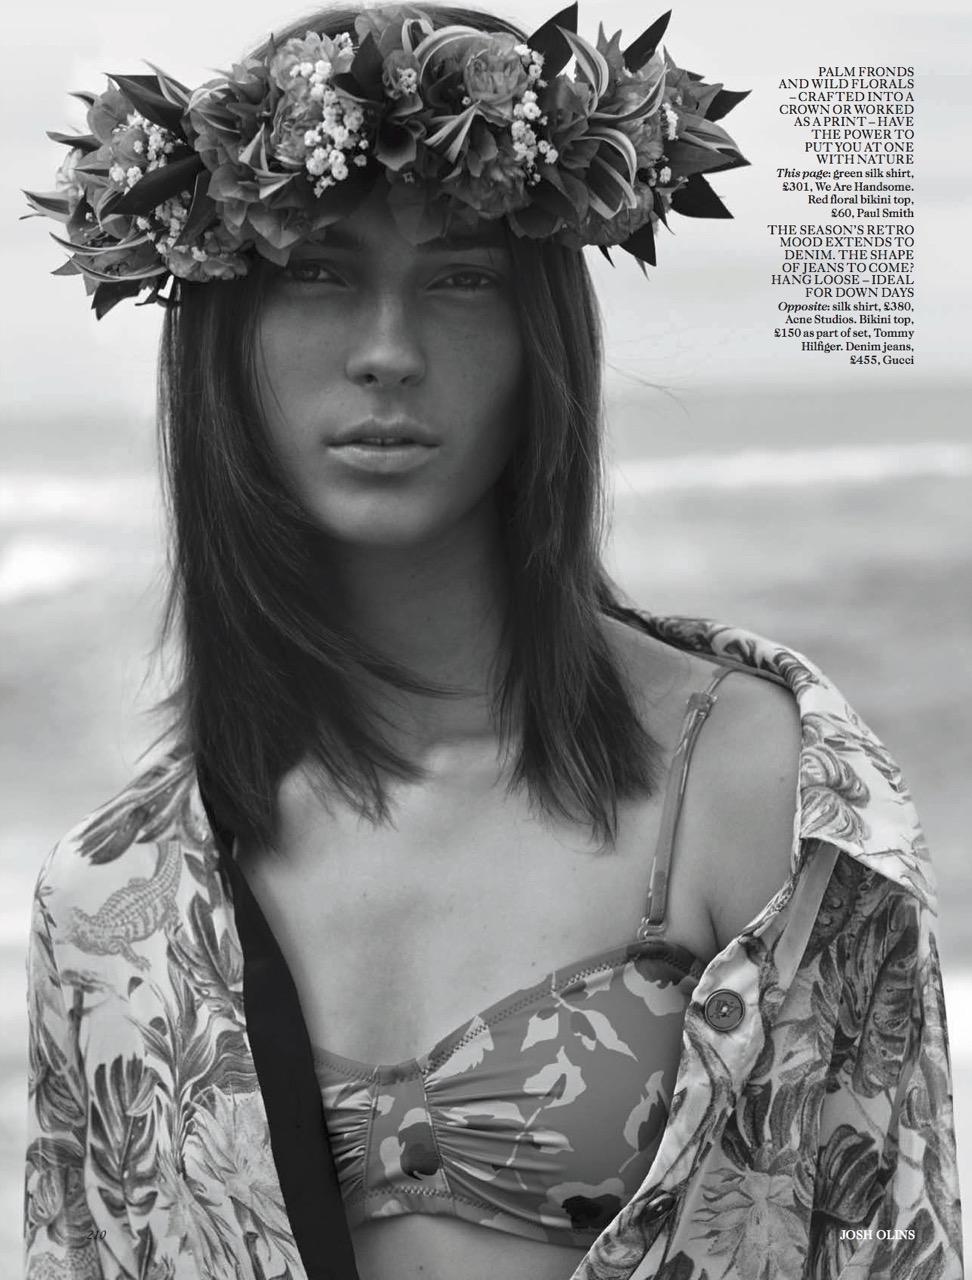 Vogue_Standard_05-02-2015_210.jpg